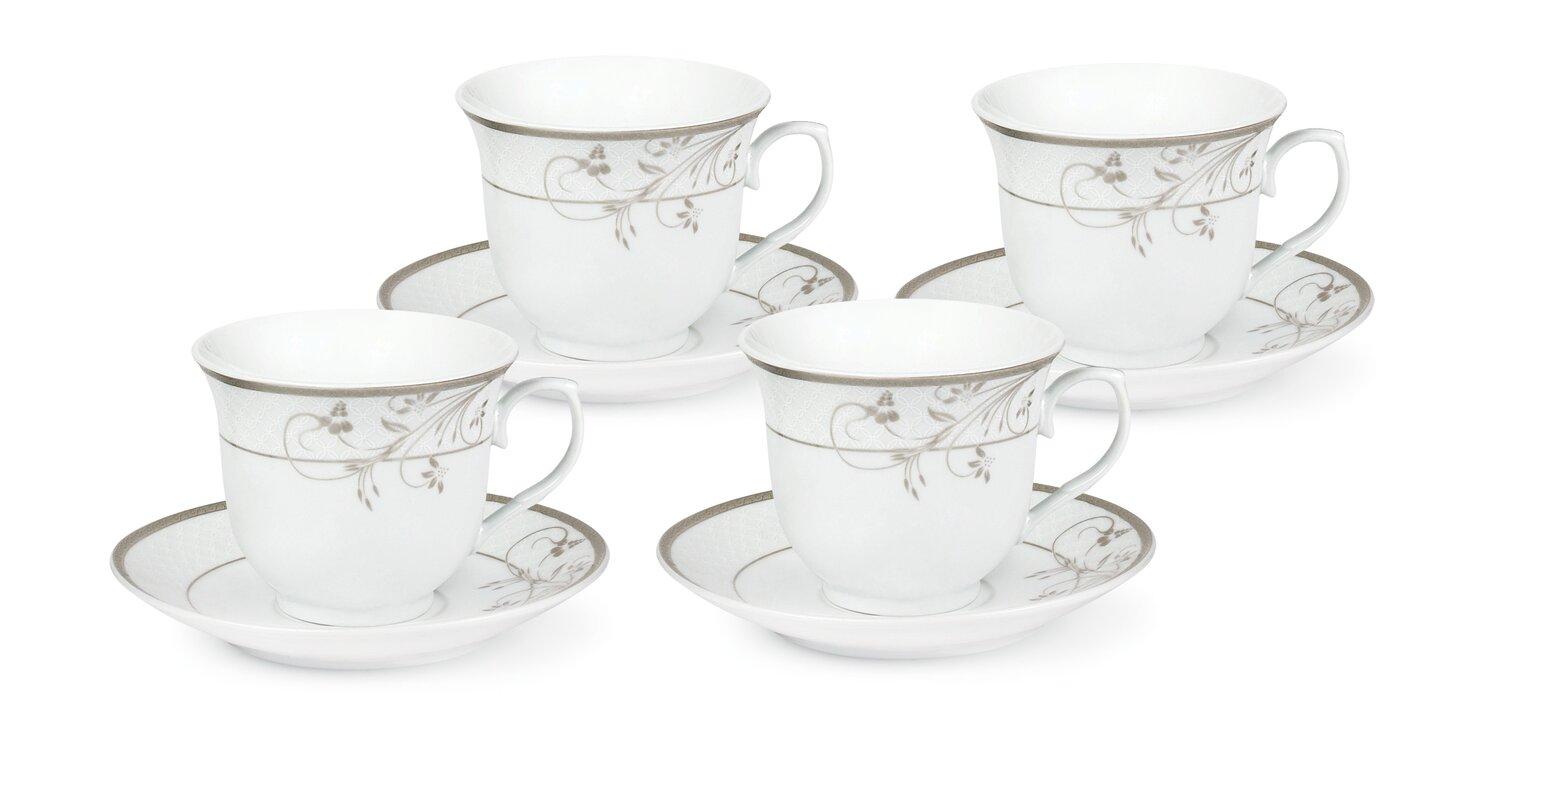 Tea/Coffee Cup and Saucer Set